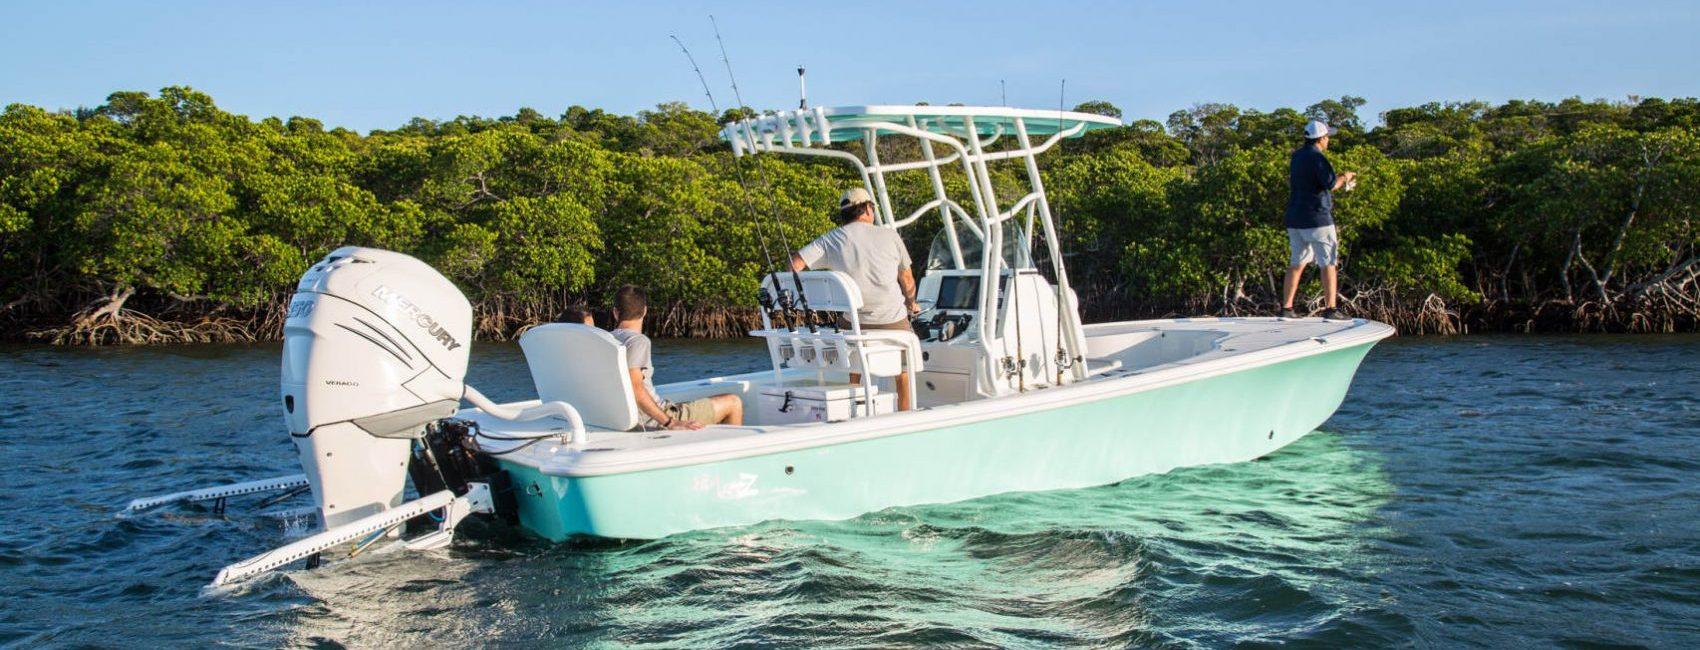 SeaVee Boat